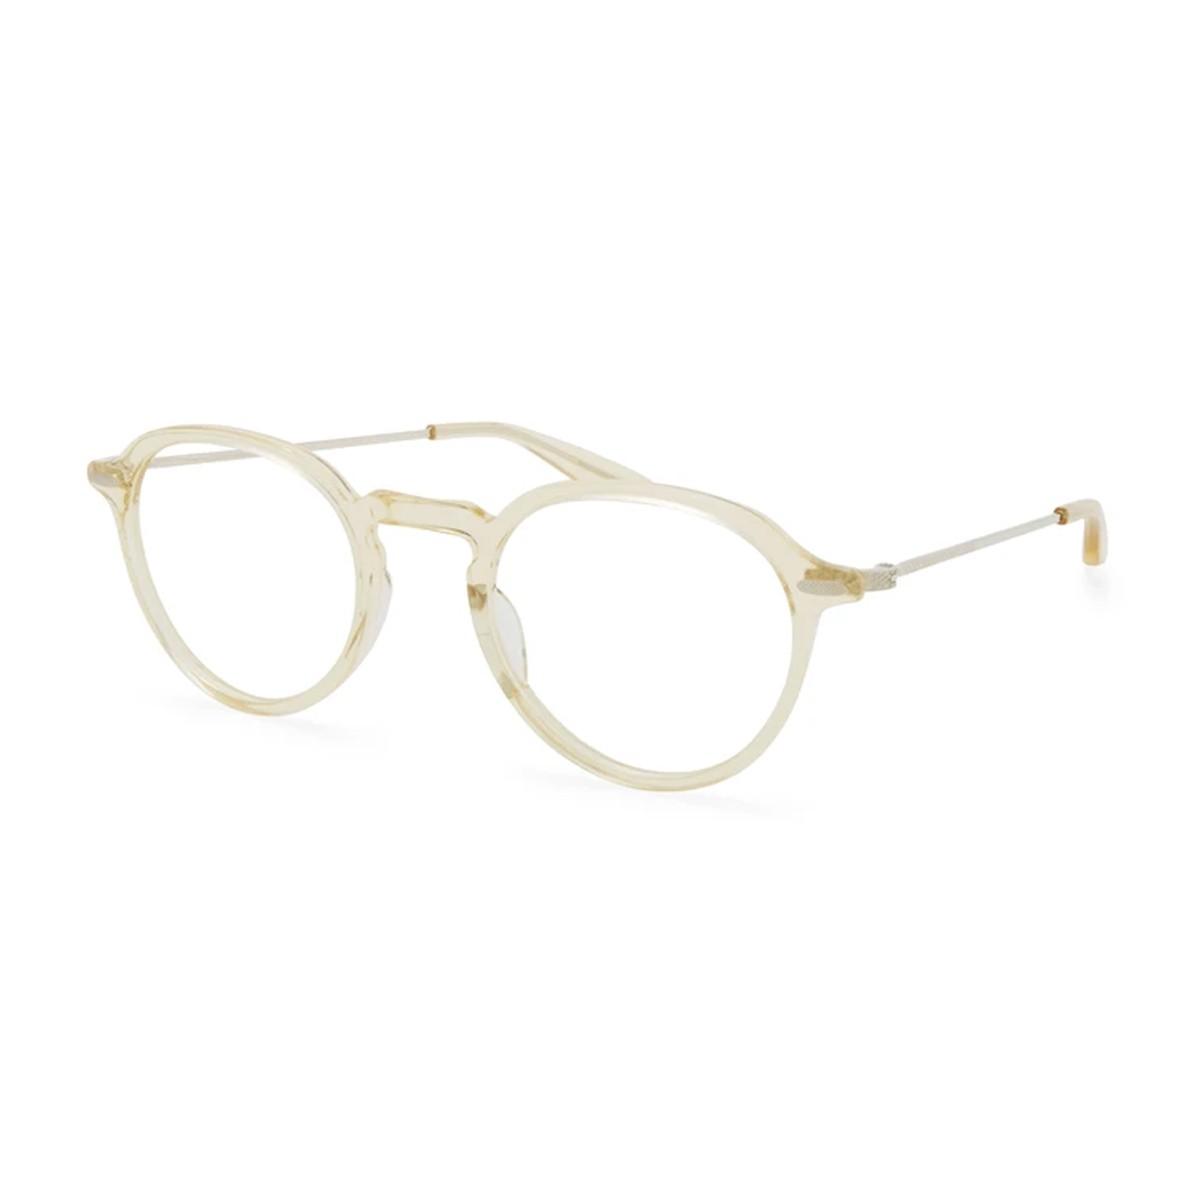 Barton Perreira BP5025 | Occhiali da vista Unisex